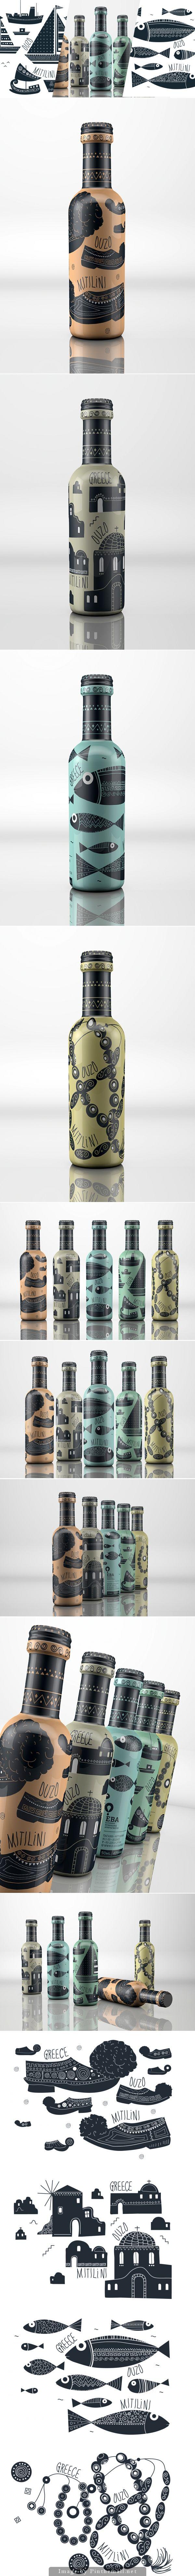 Taste of Greece #packaging #design #inspiration PD